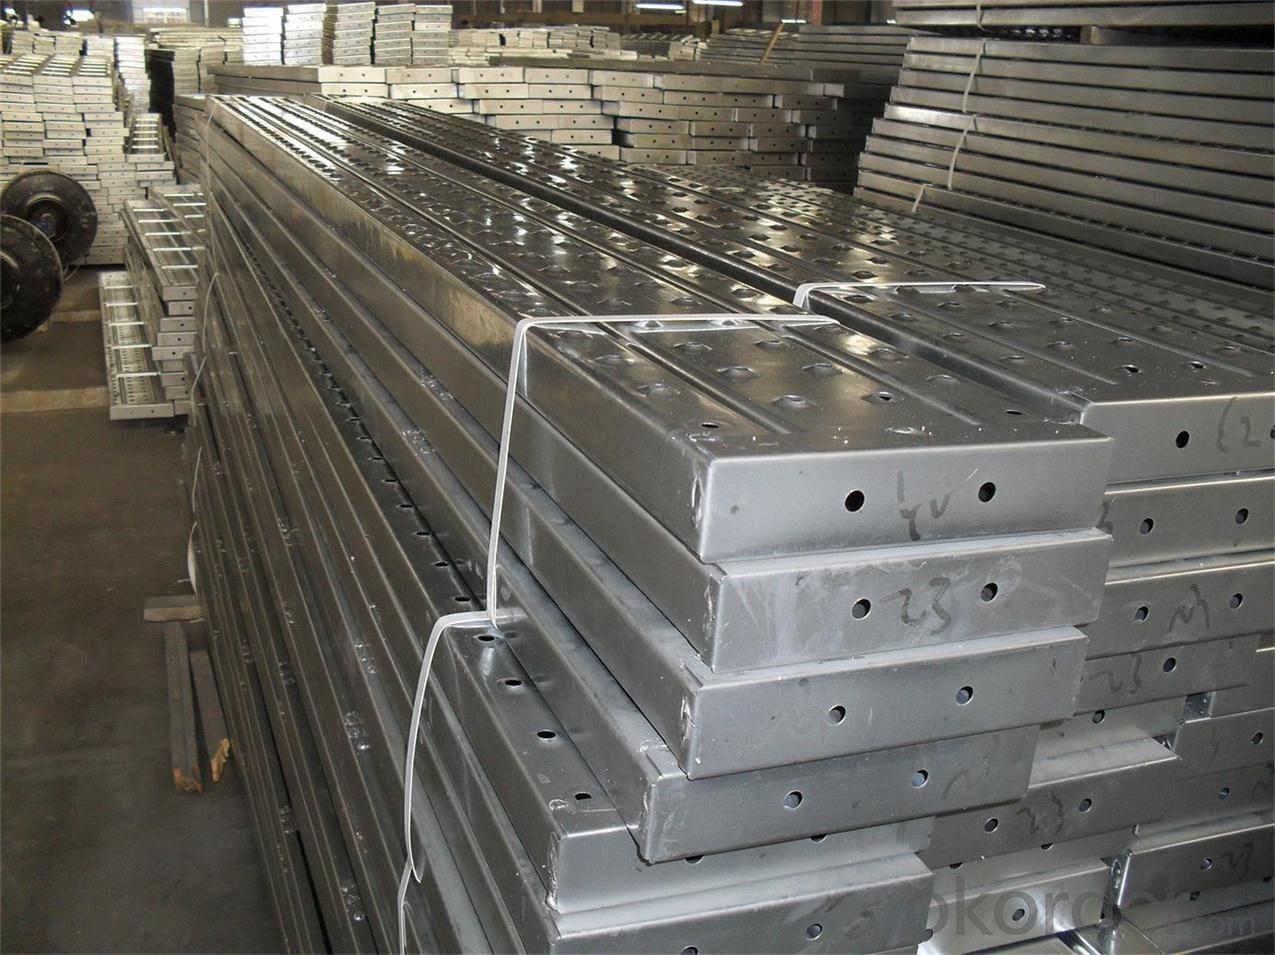 Hot Dip Galvanized Steel Pedals